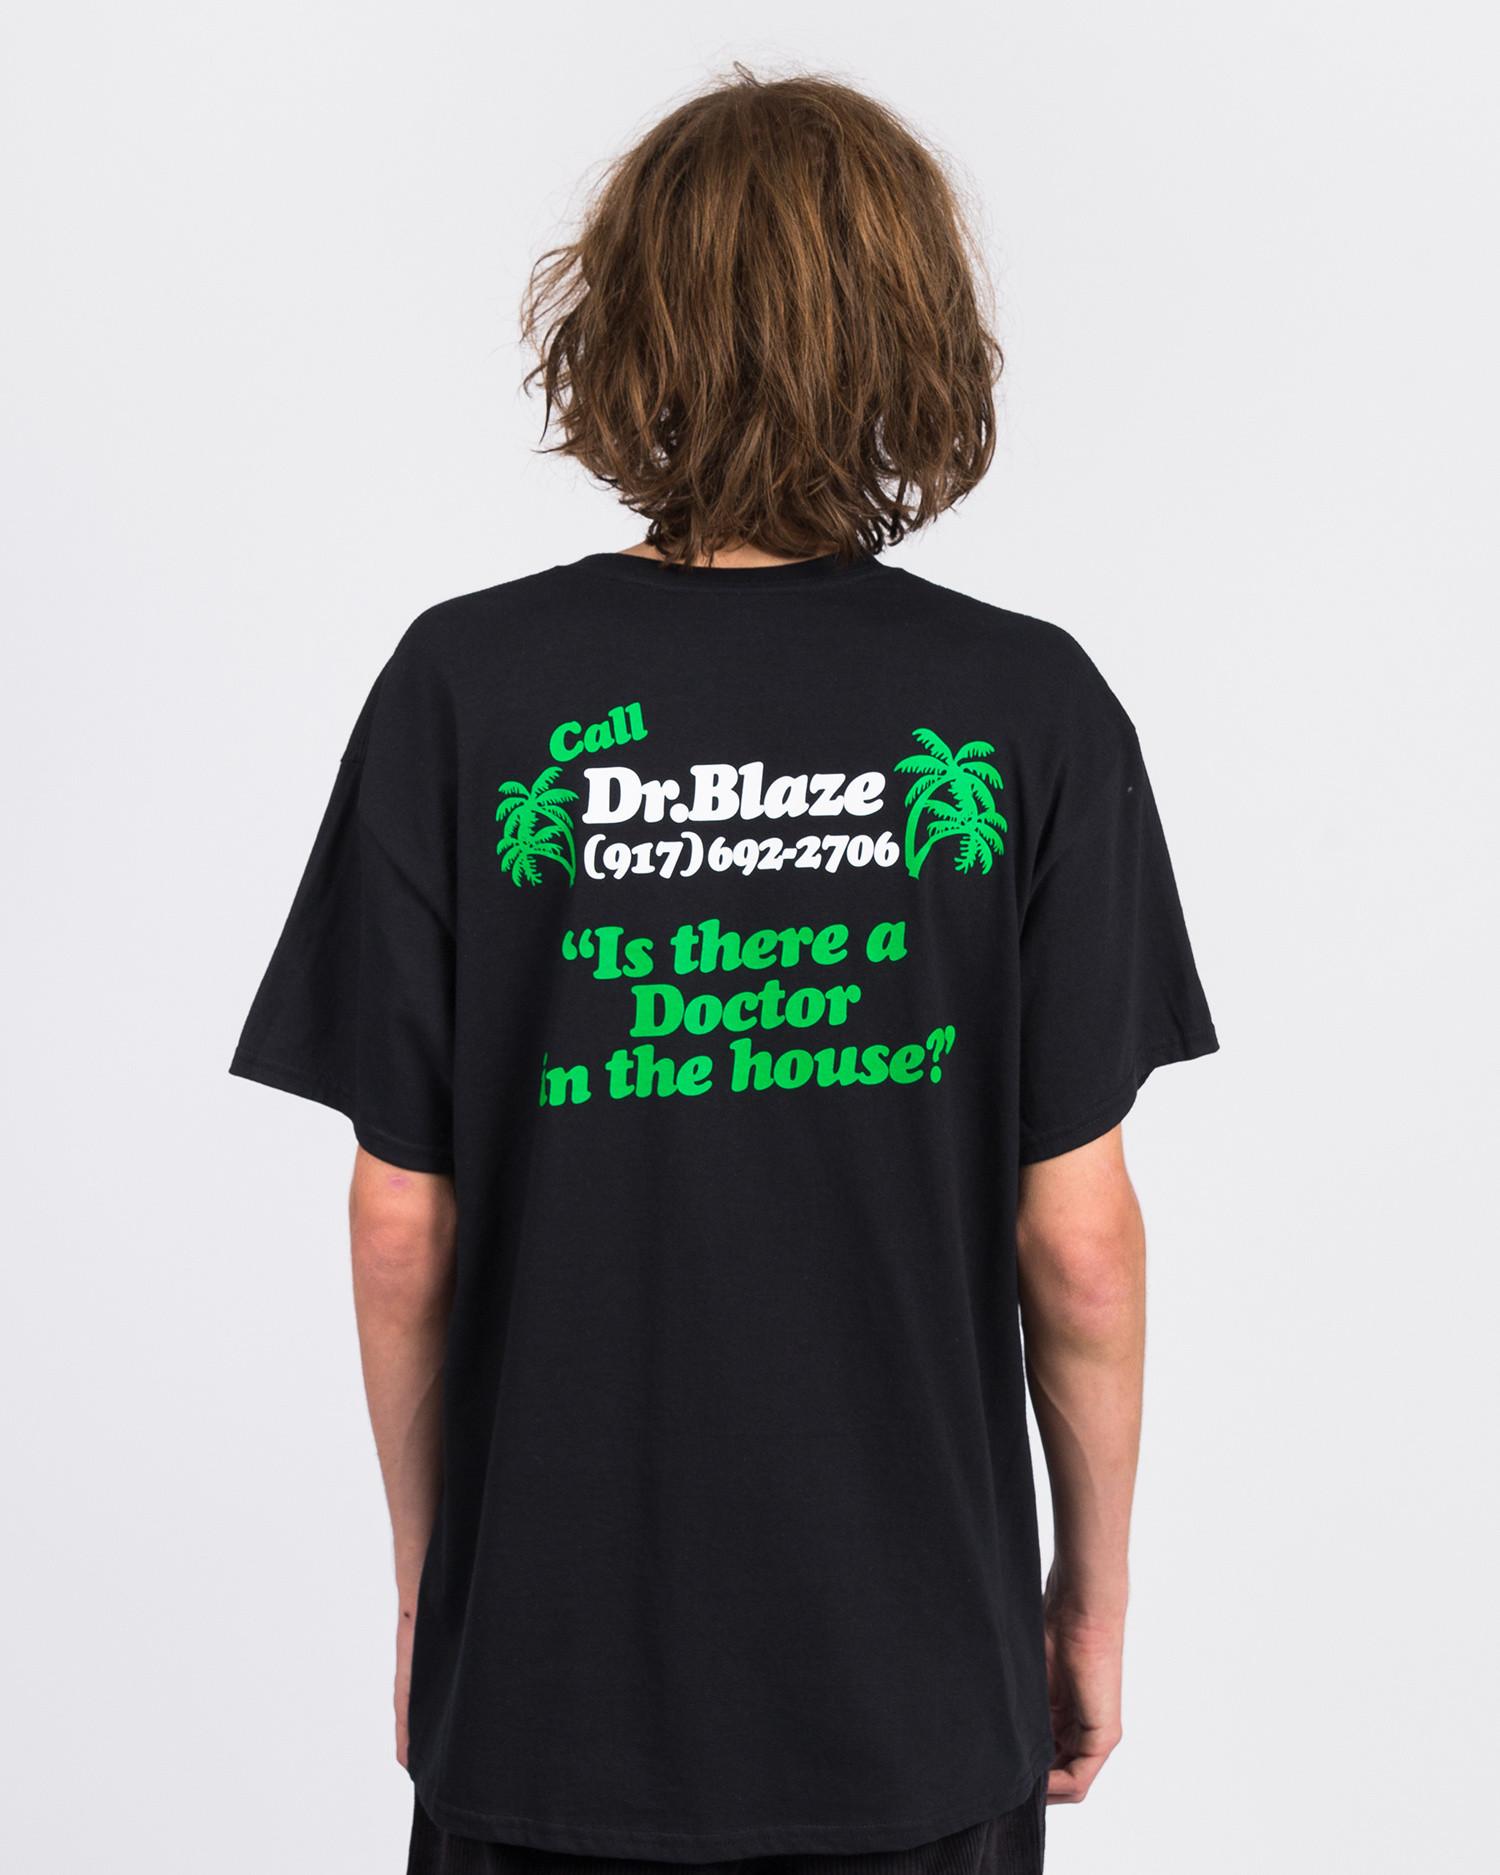 Call me 917 Dr. Blaze T-shirt Black